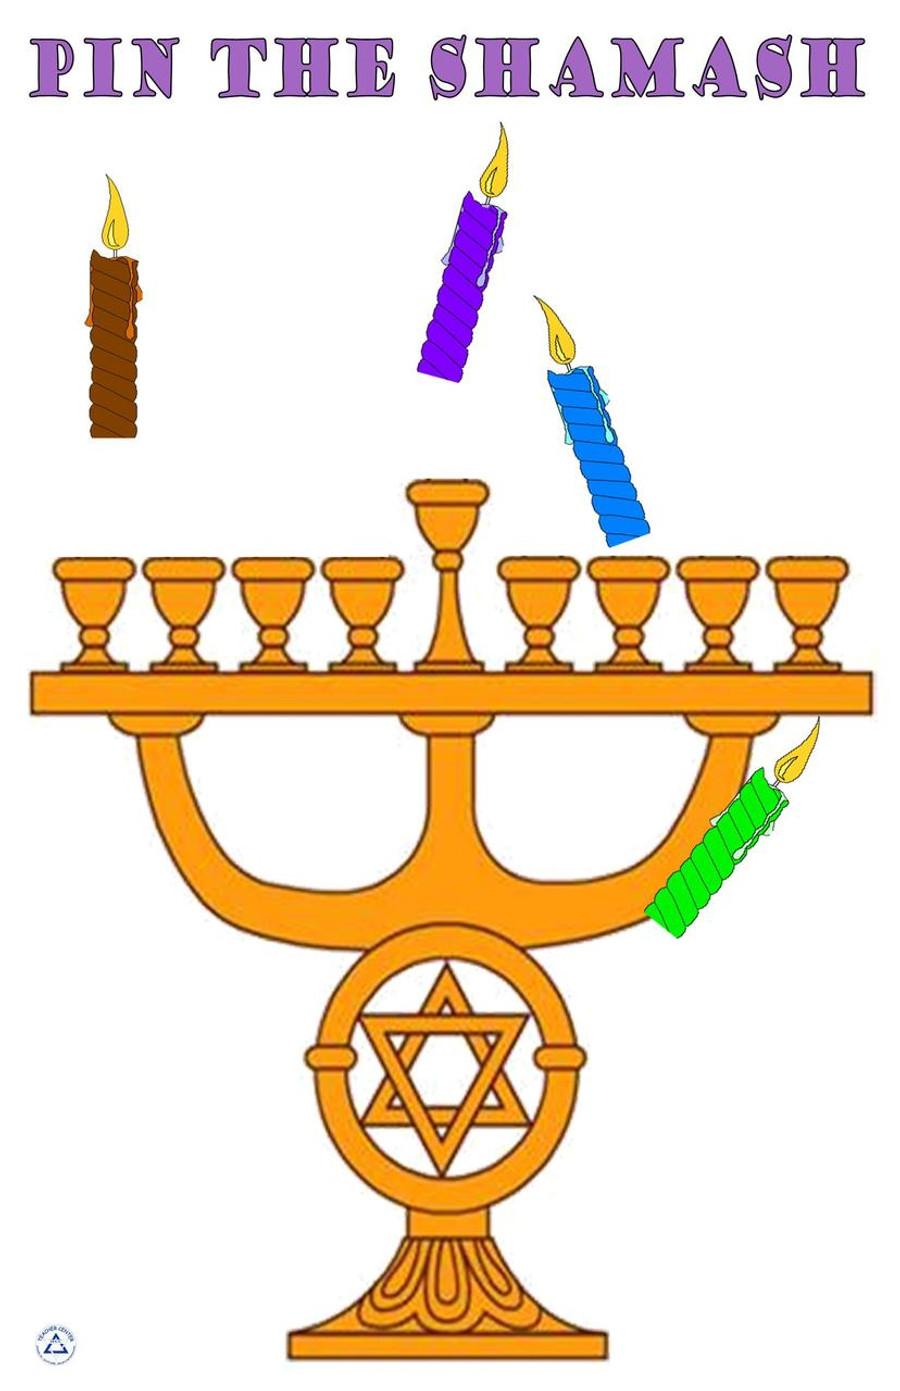 Pin the Shammash on the Menorah